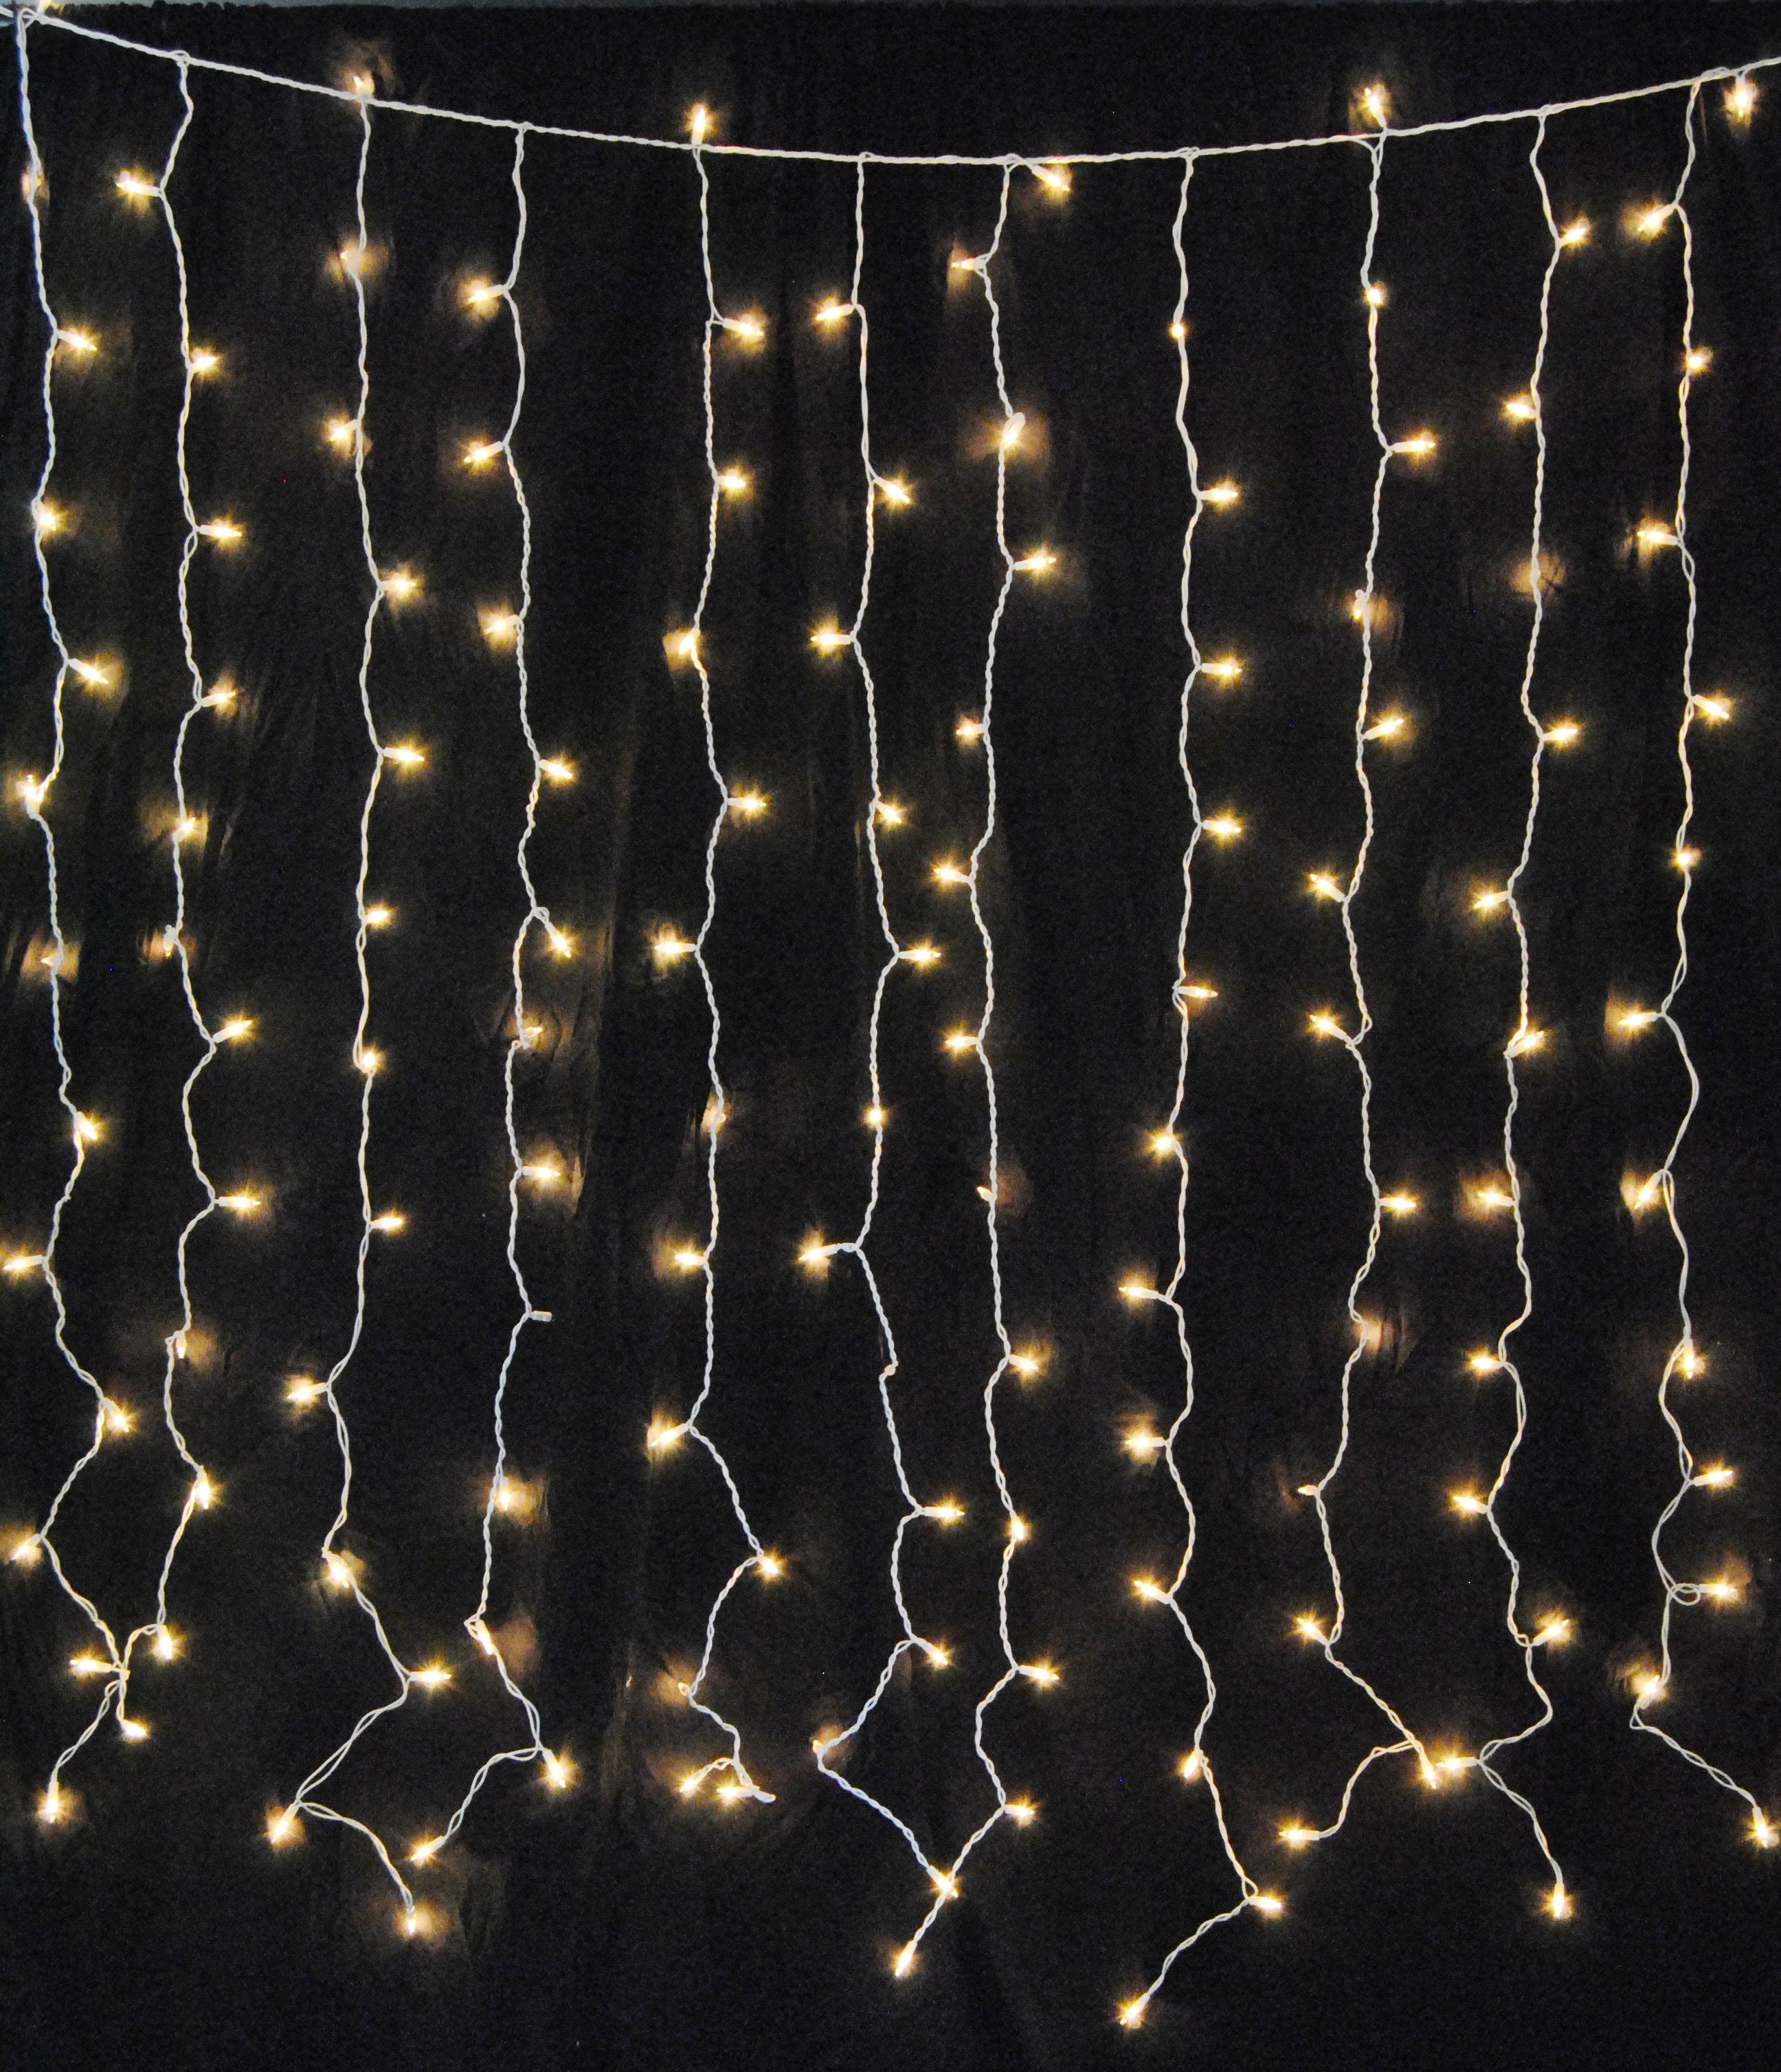 warm white led curtain lights 150 twinkle lights